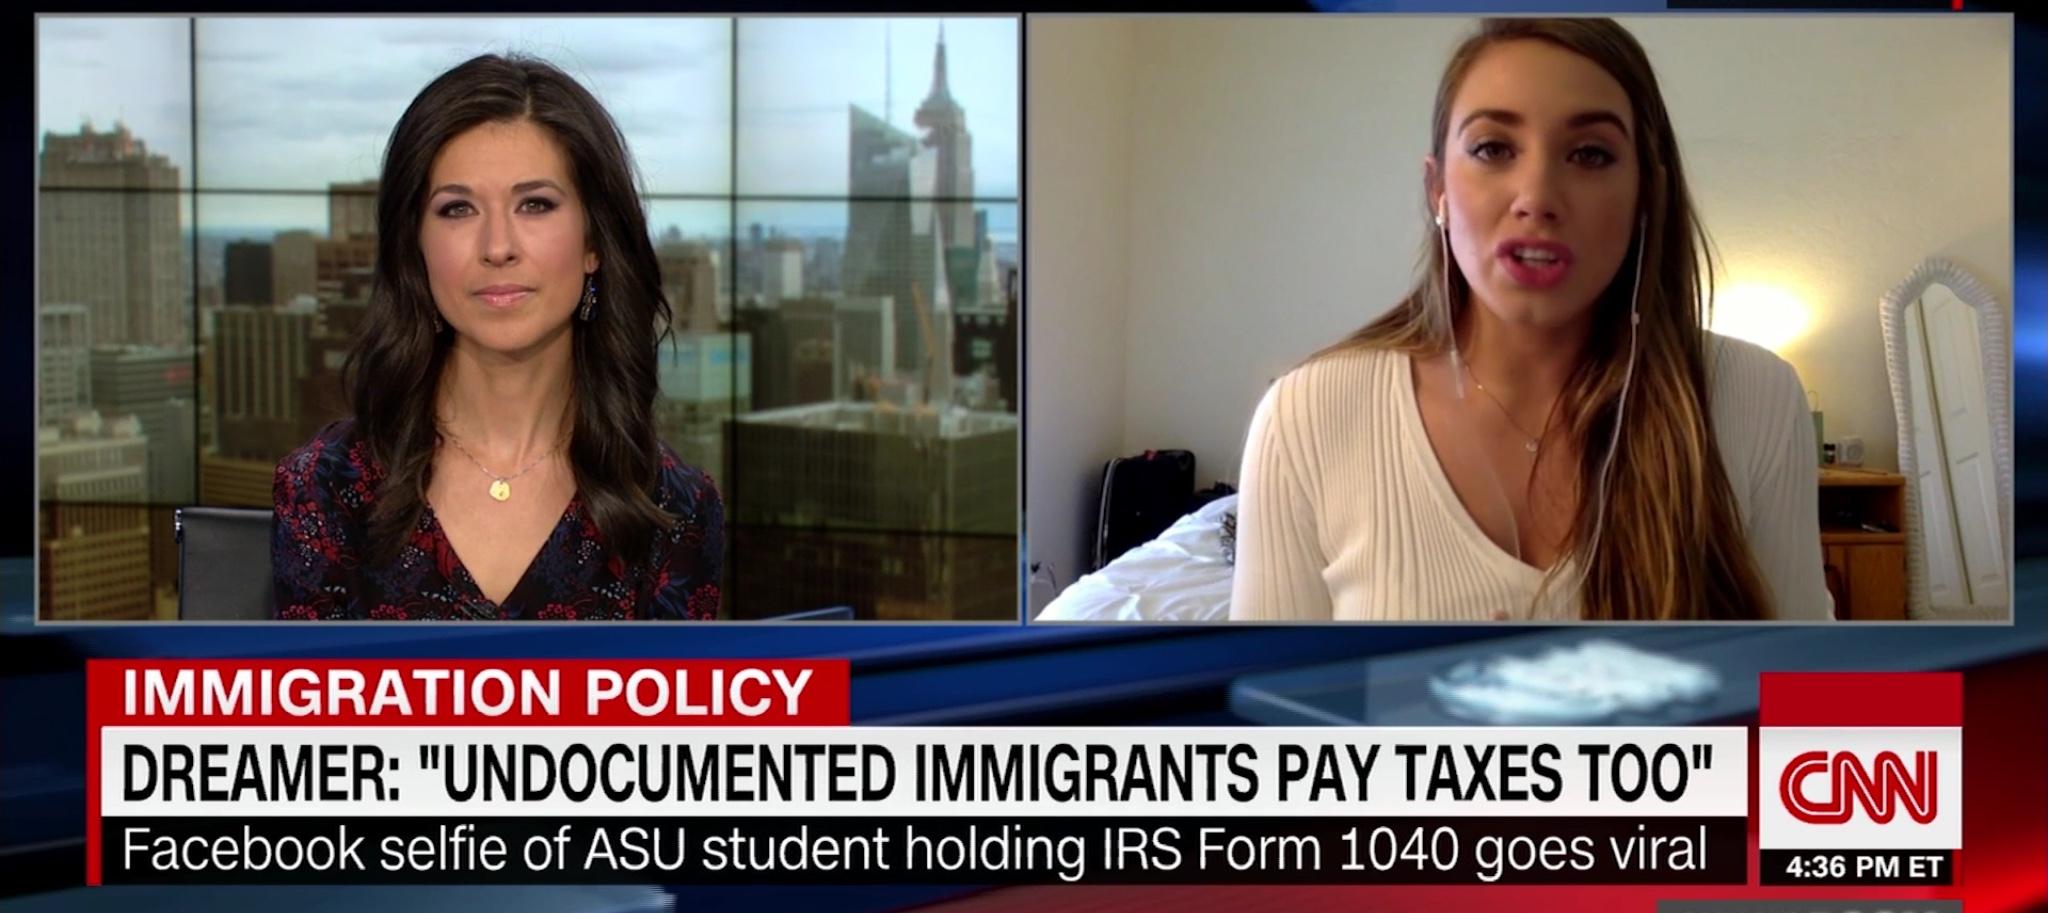 Belén Sisa is interviewed on CNN regarding her status as an illegal immigrant. CNN screen capture, March 1, 2018.